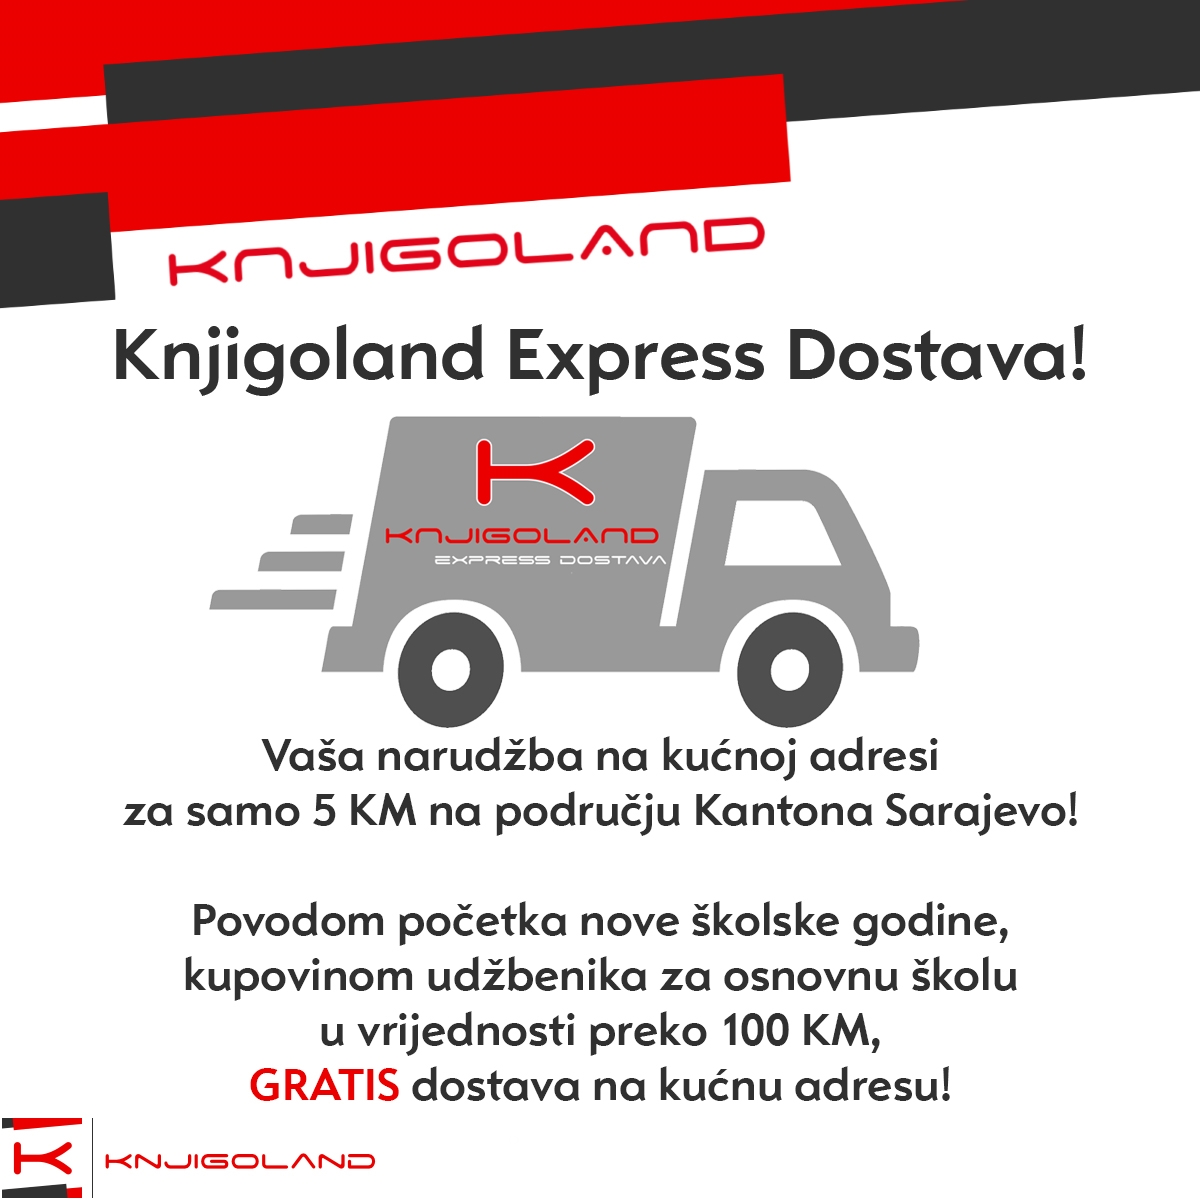 Knjigoland Express Dostava